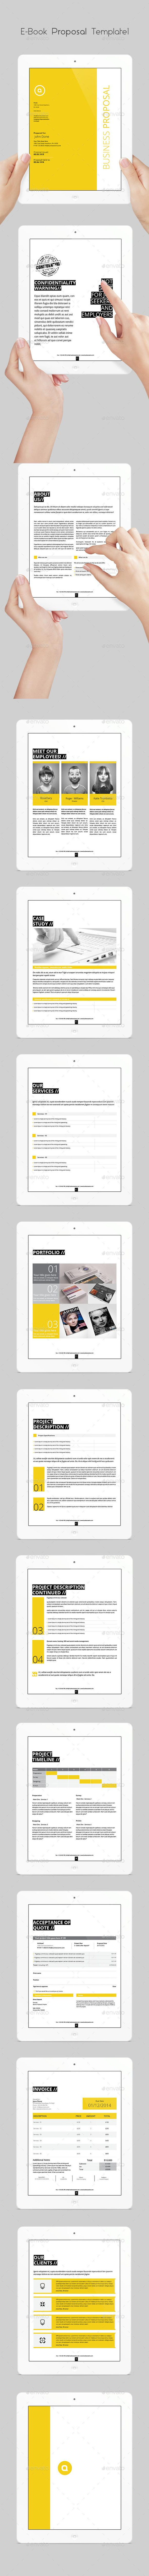 E-book Proposal Template